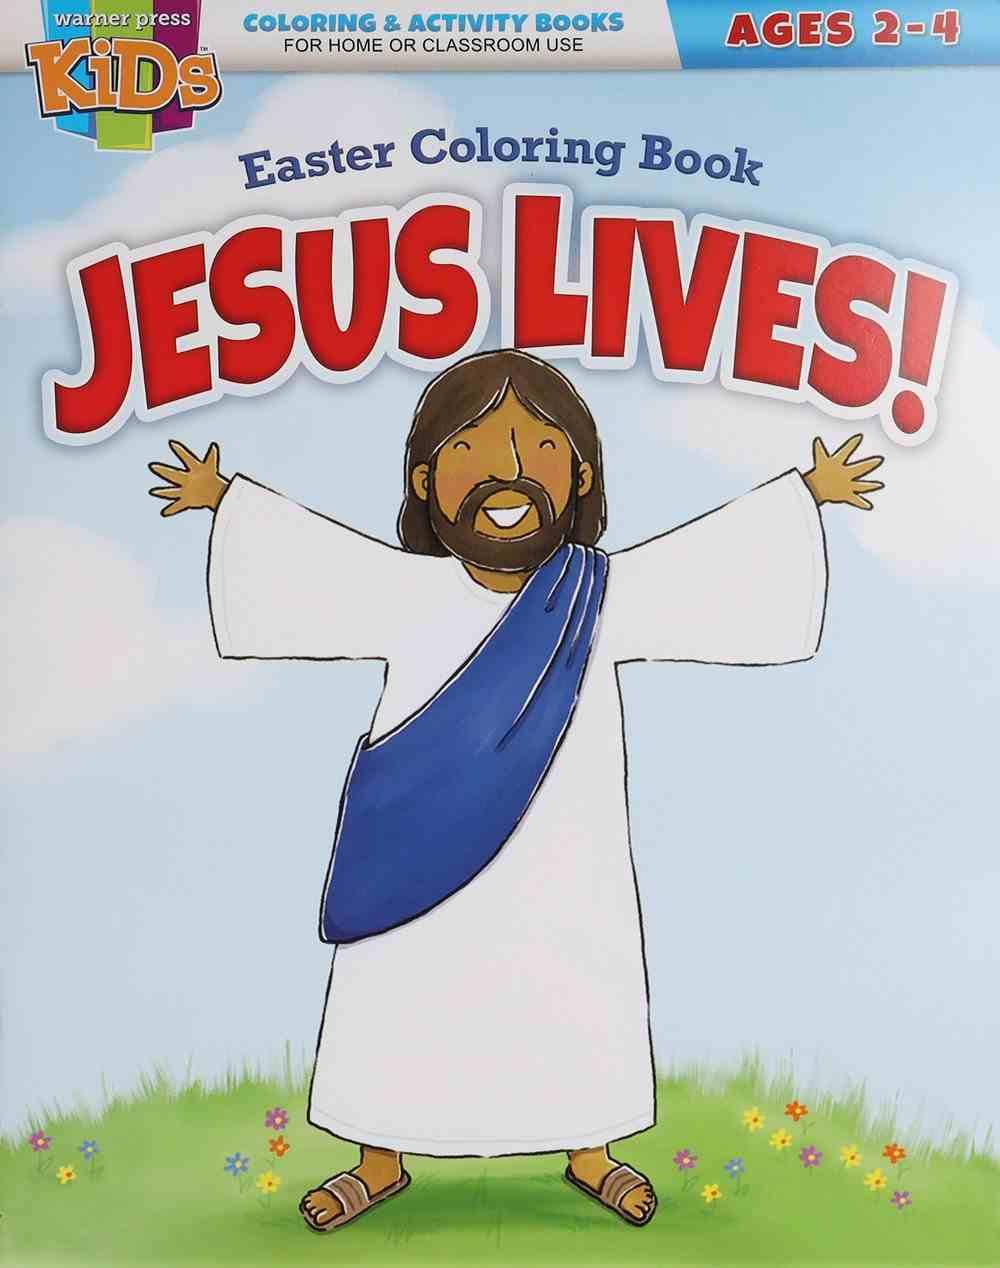 Jesus Lives! Easter Coloring Book (Warner Press Colouring/activity Under 5's Series) Paperback